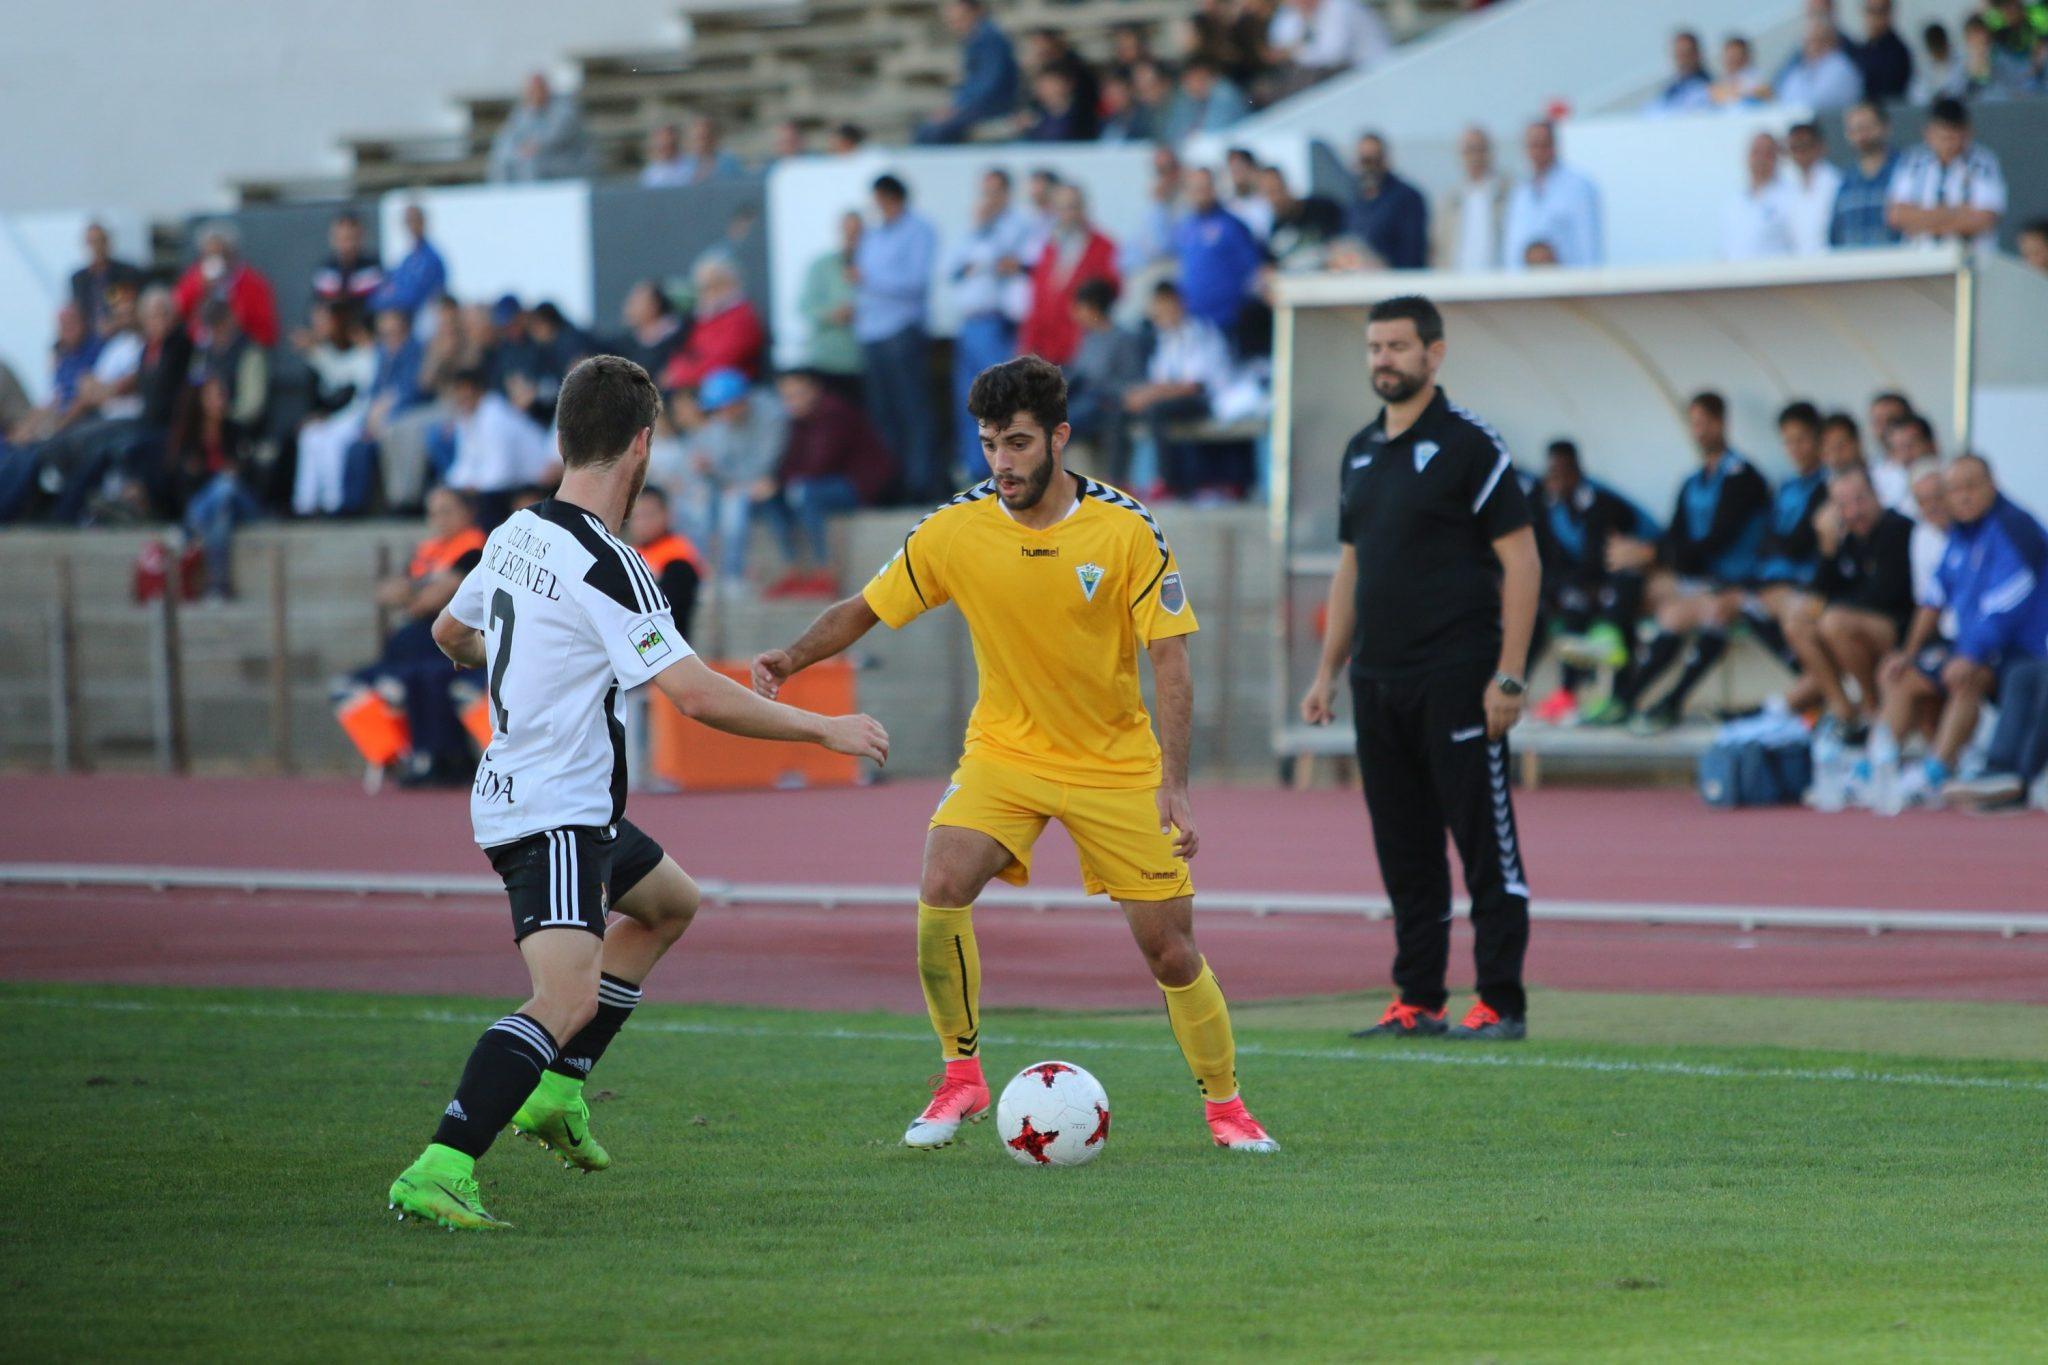 Marbella FC vs Balompédica Linense